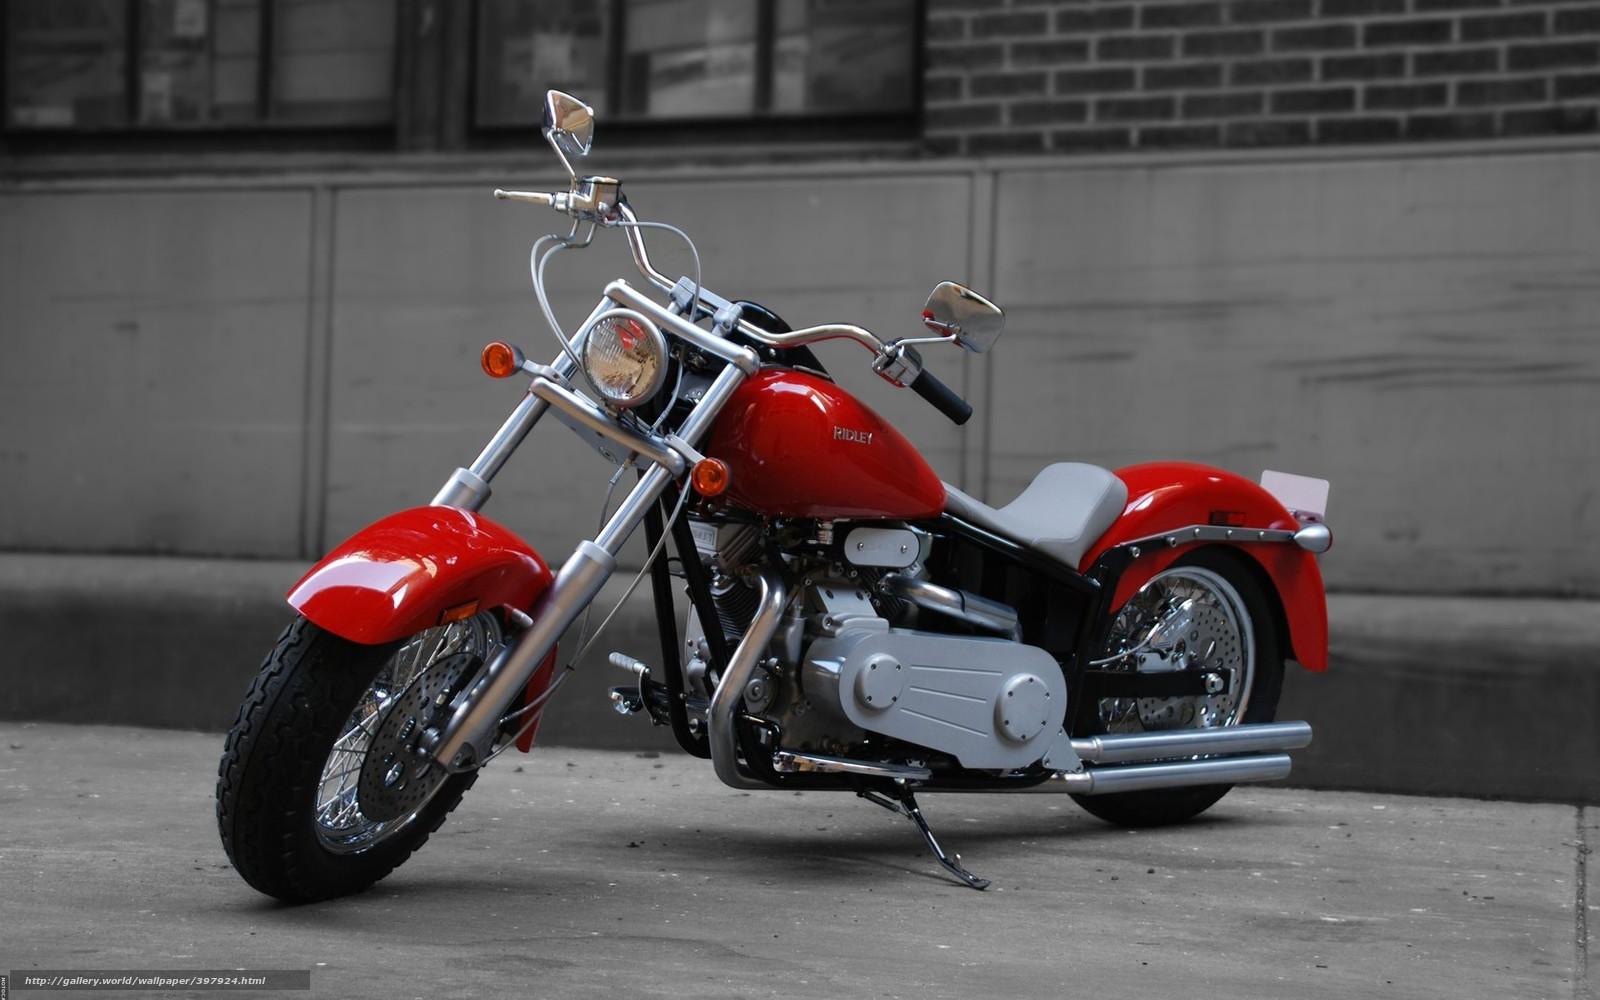 cruiser motorcycle wallpaper hd - photo #19